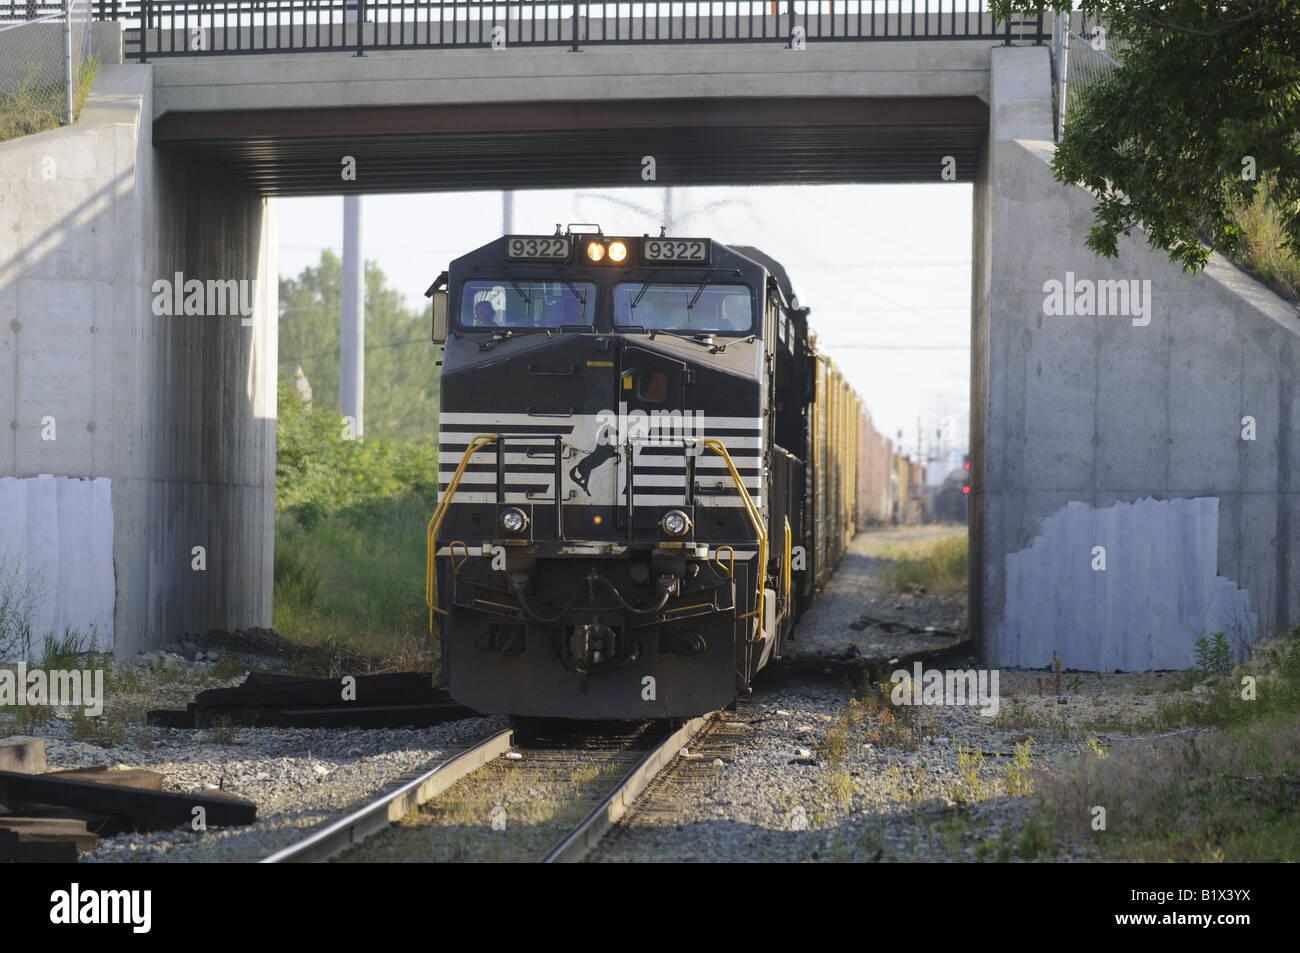 A diesel locomotive pulls a long freight train through an ...